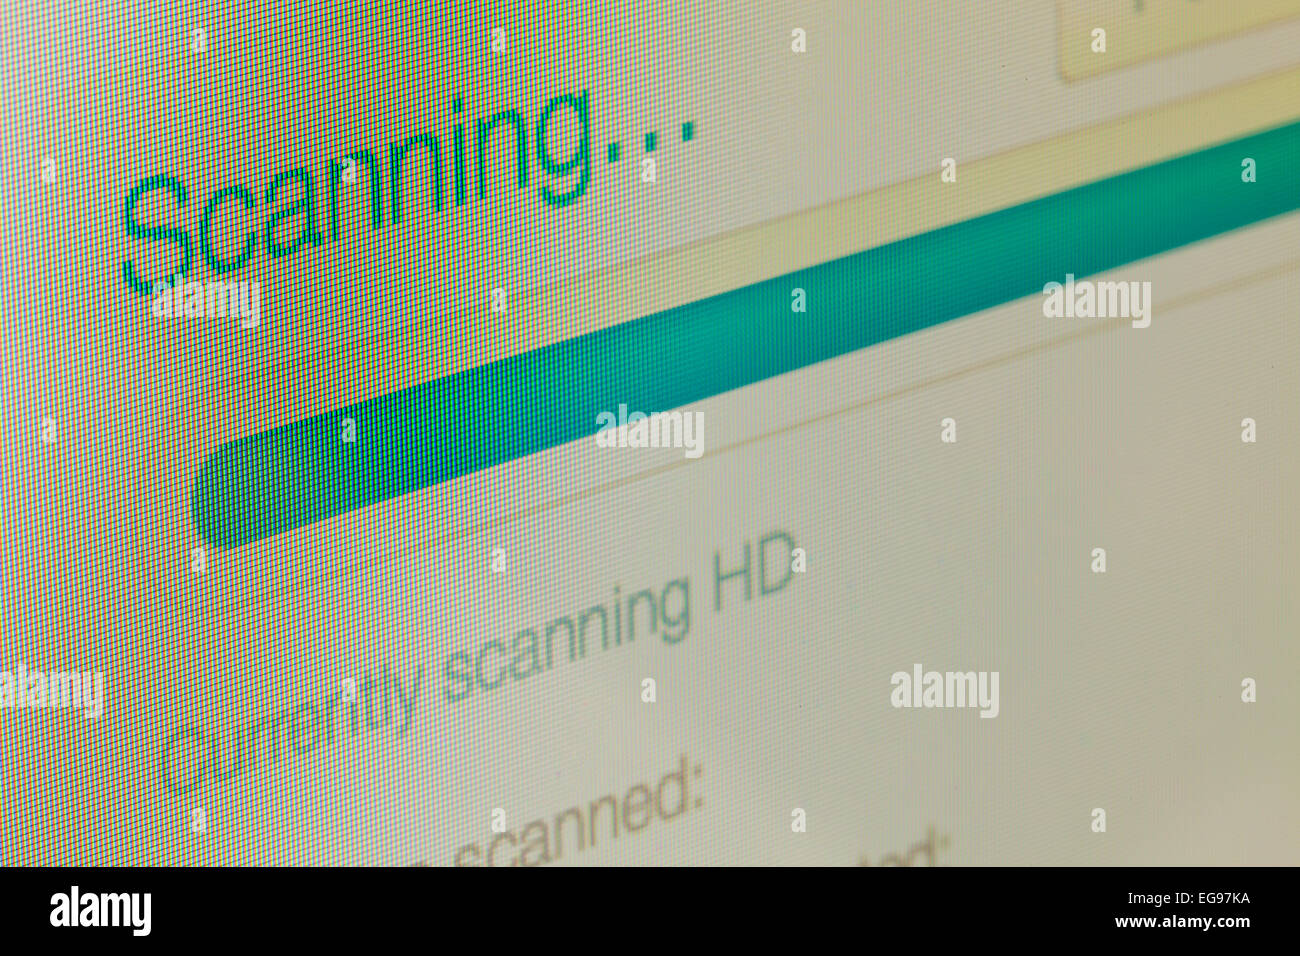 Anti Virus scanning message on LCD computer screen - Stock Image